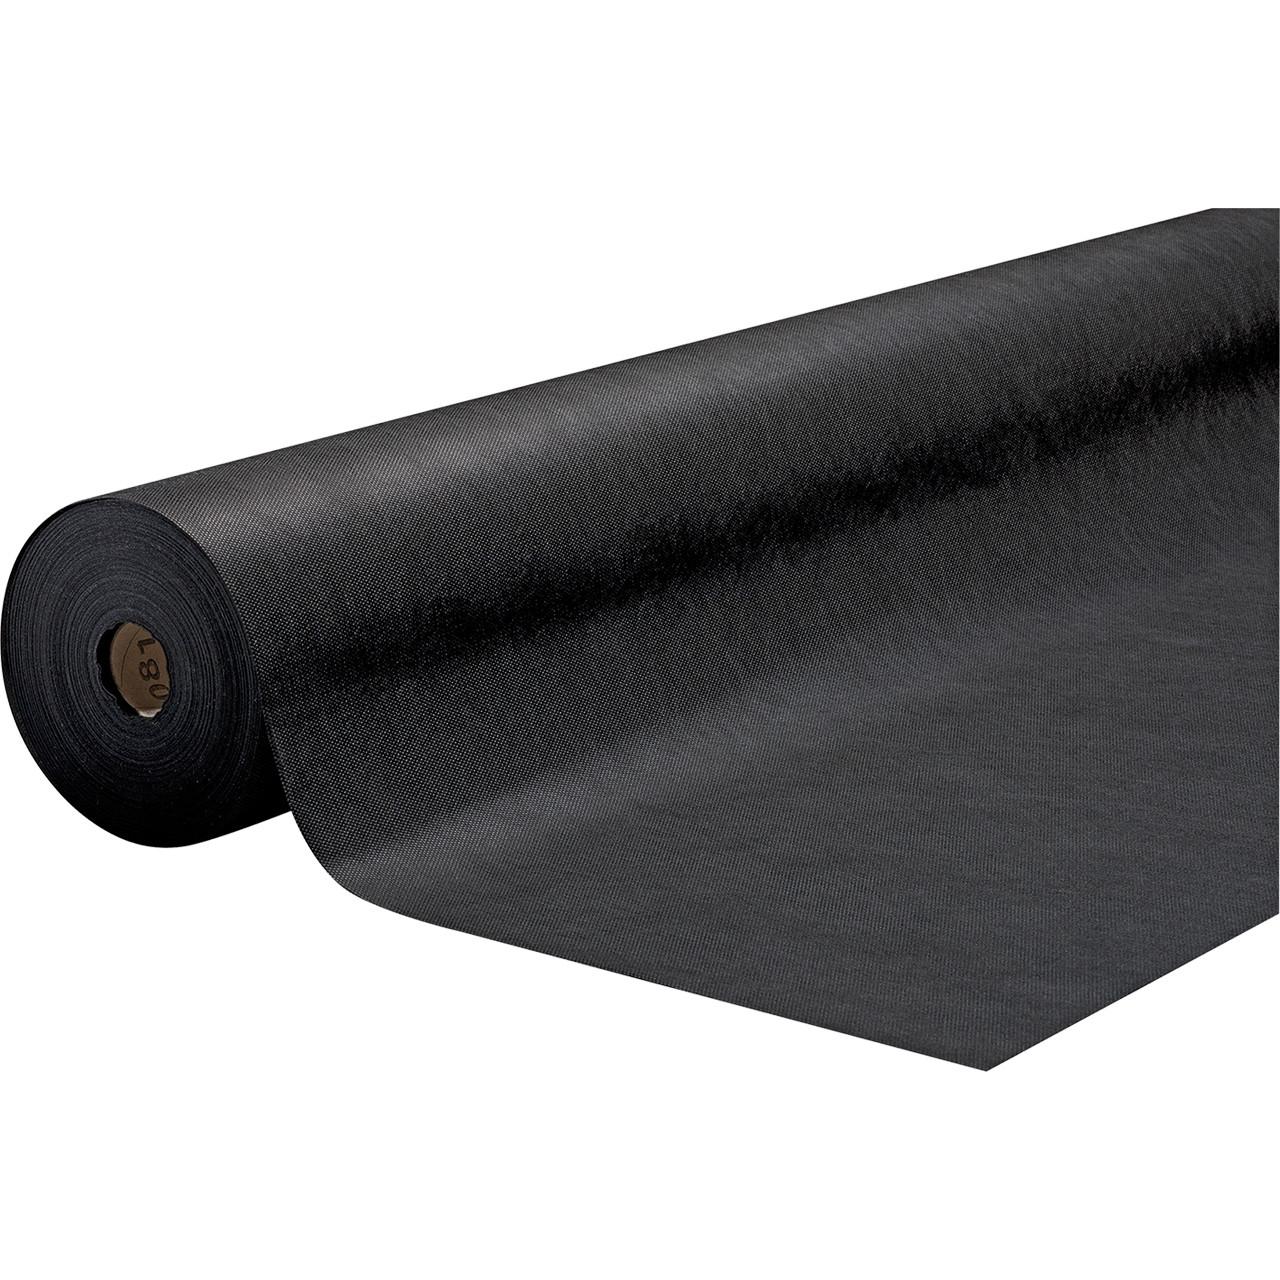 Estovalles goma camps negre individual 1,20 x 50m